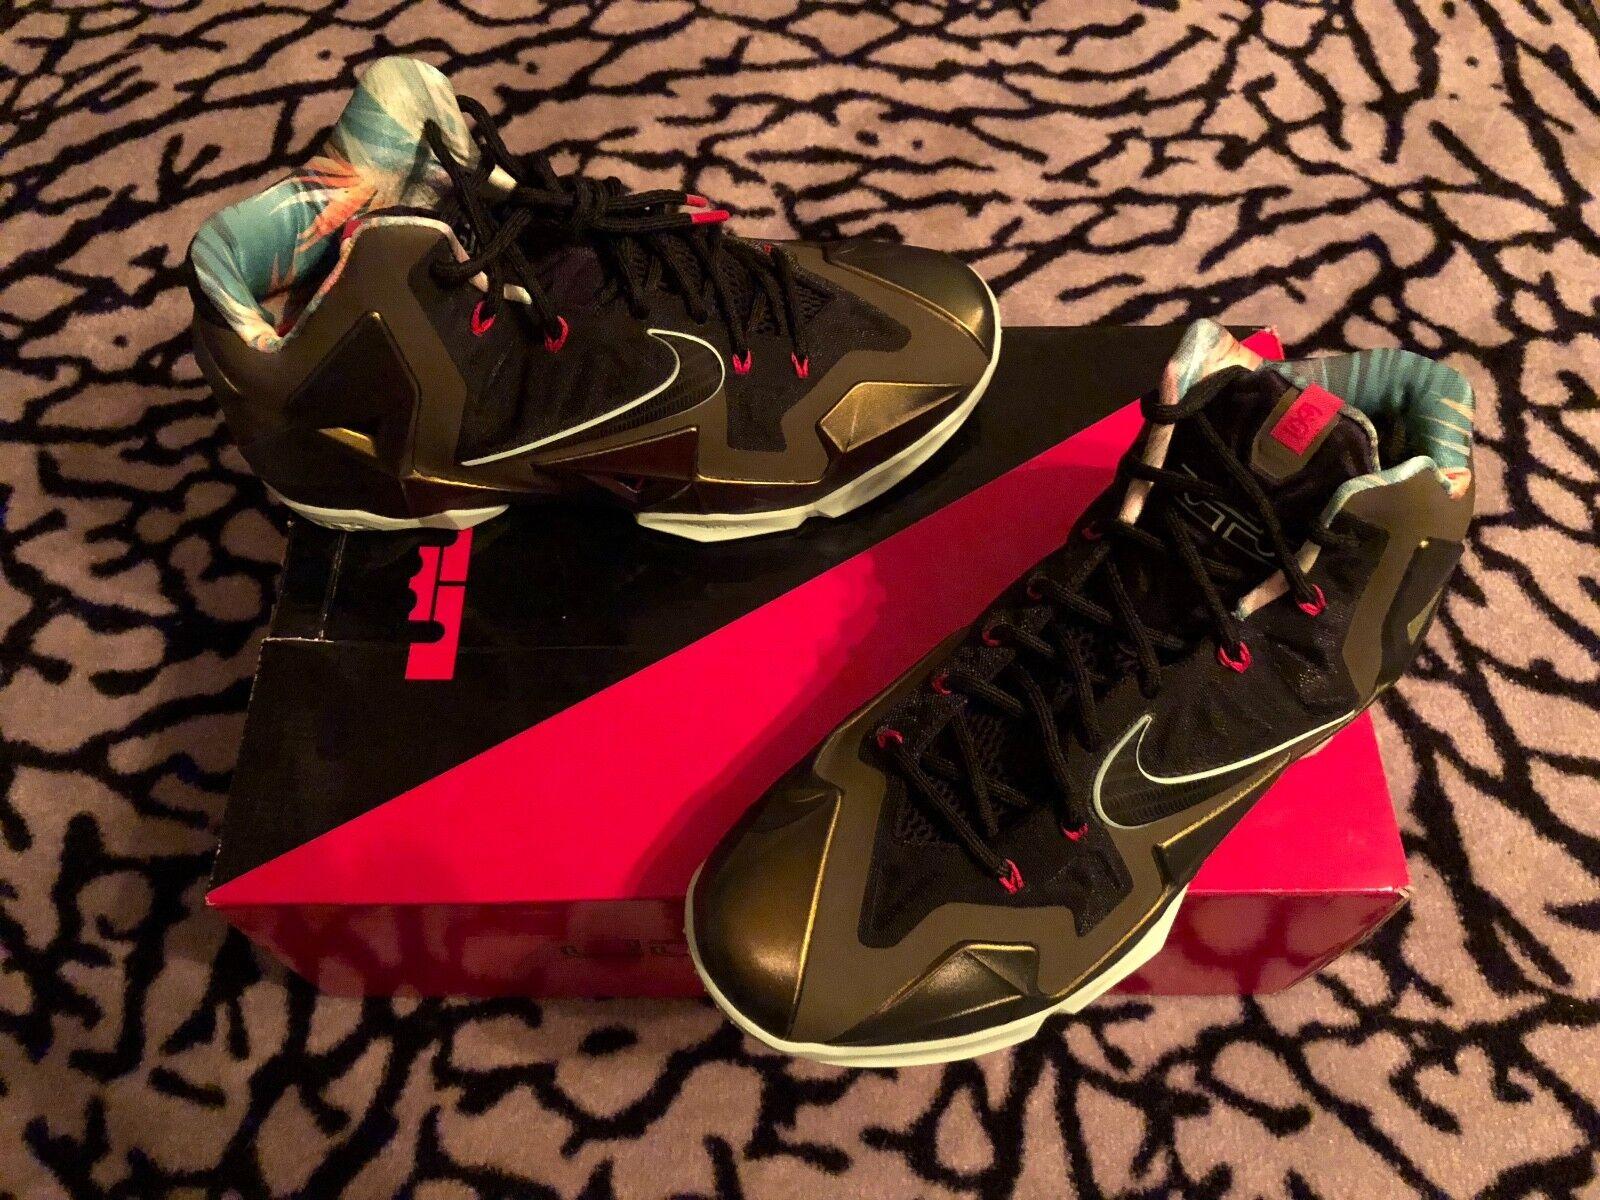 new style e8e16 eb610 Nike Lebron XI Kings Pride Parachute Gold 10 DS DS DS NRG,QS,TZ